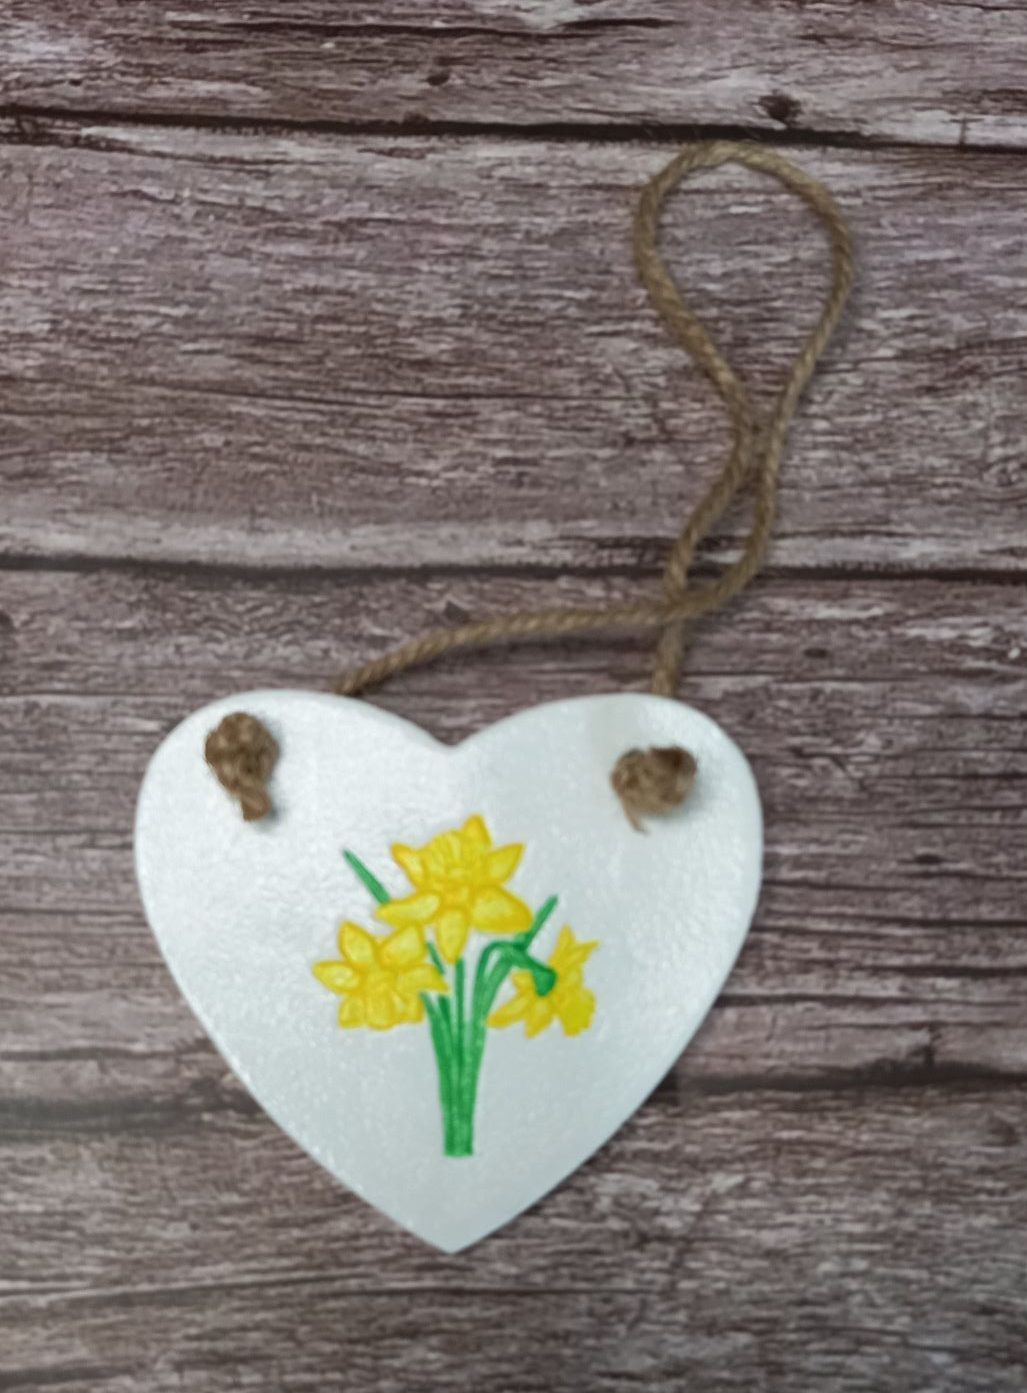 Clay Heart - Daffodils